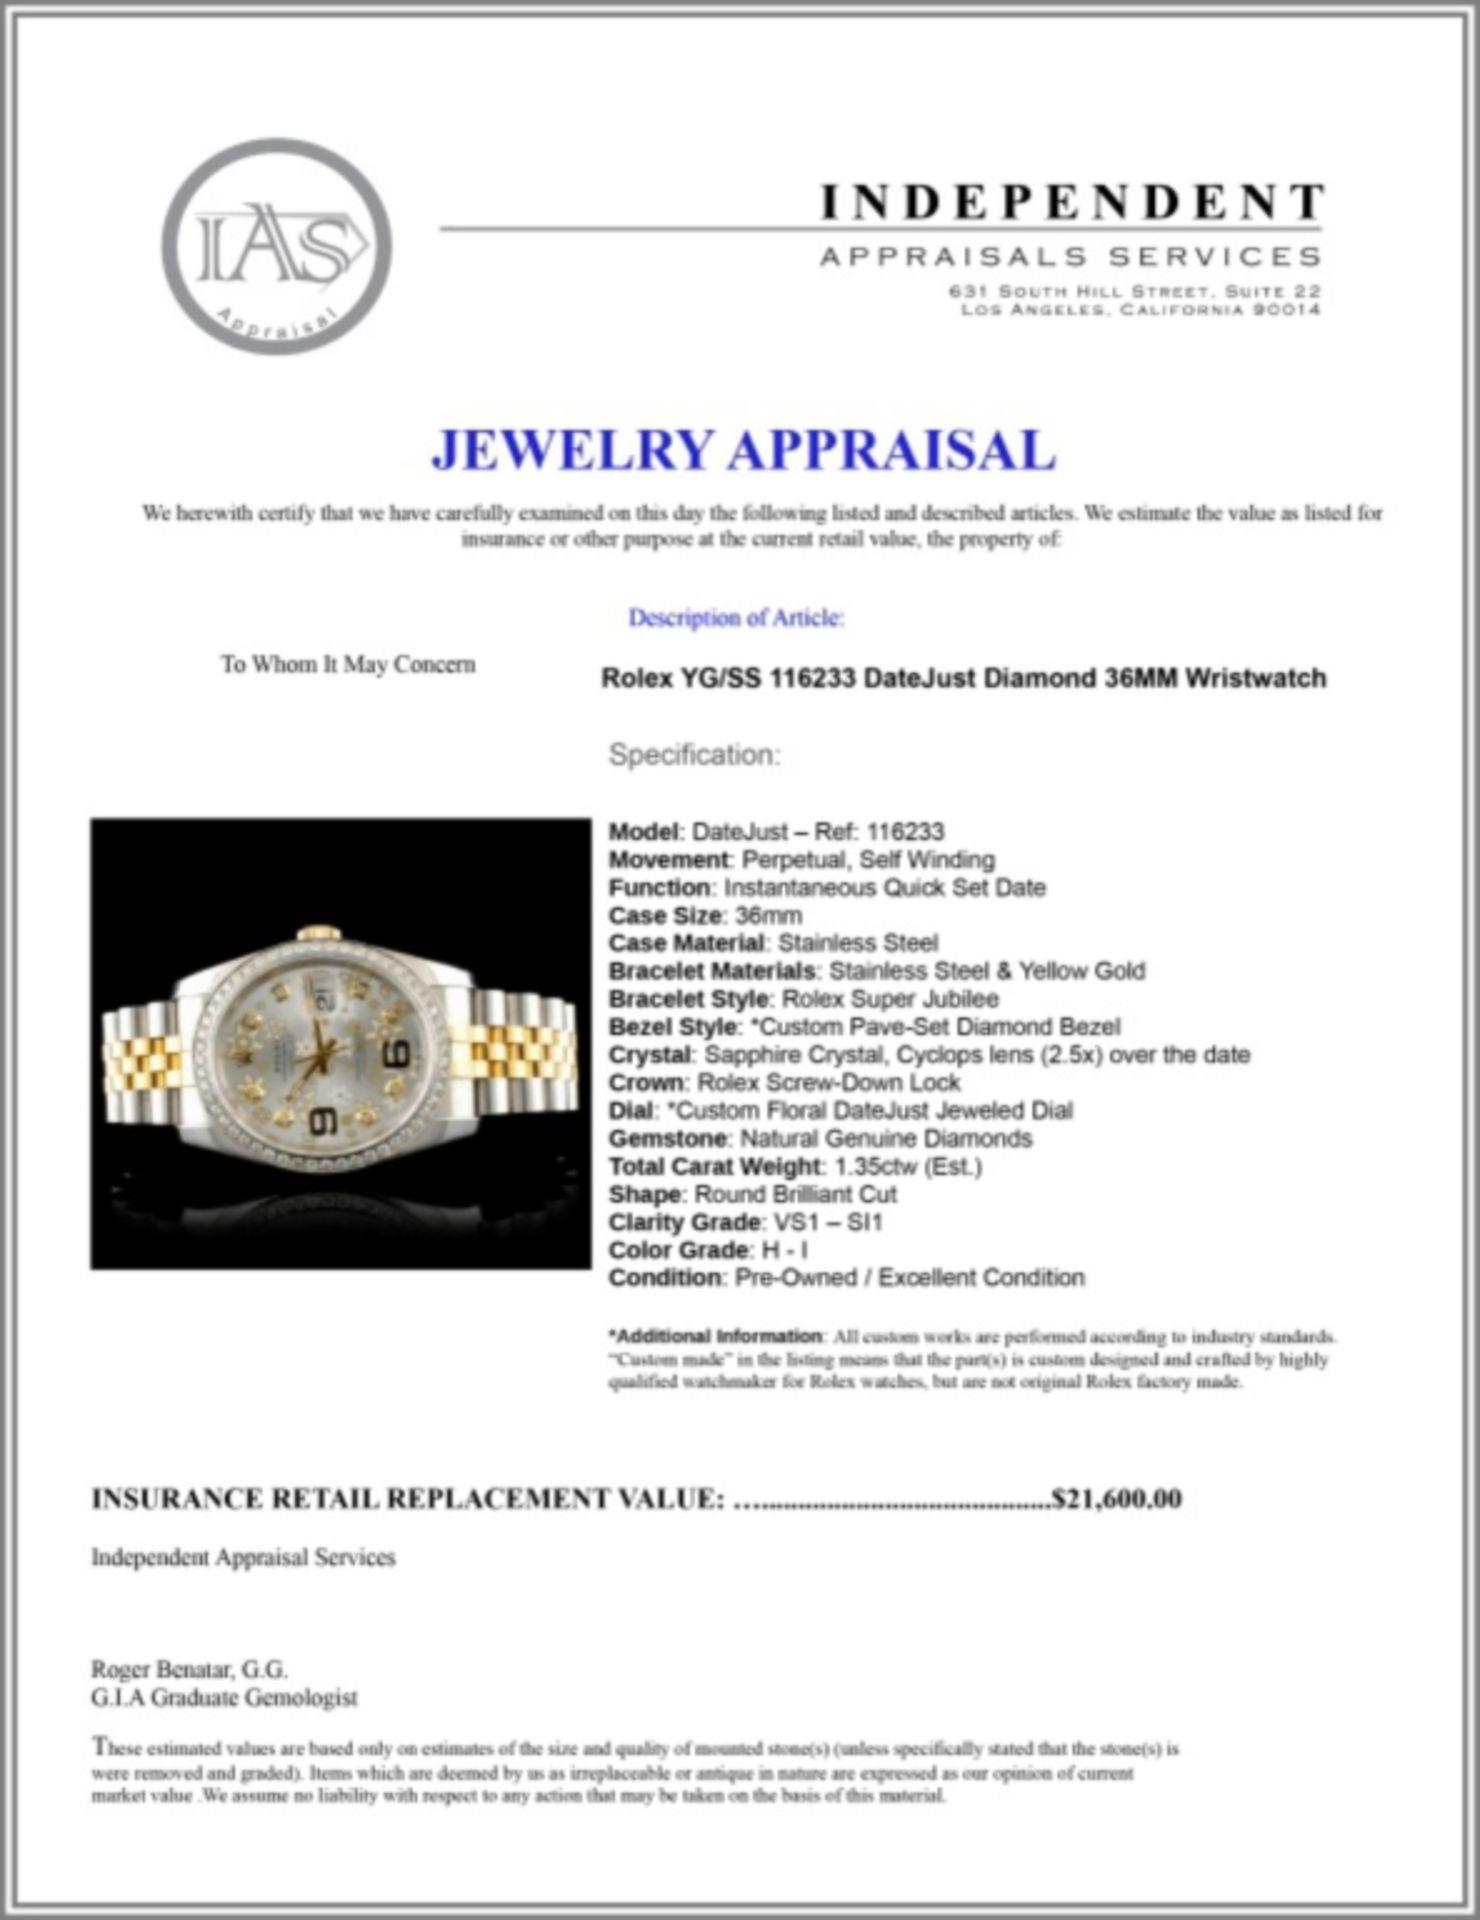 Rolex DateJust 116233 18K YG/SS Diamond 36MM Watch - Image 7 of 7